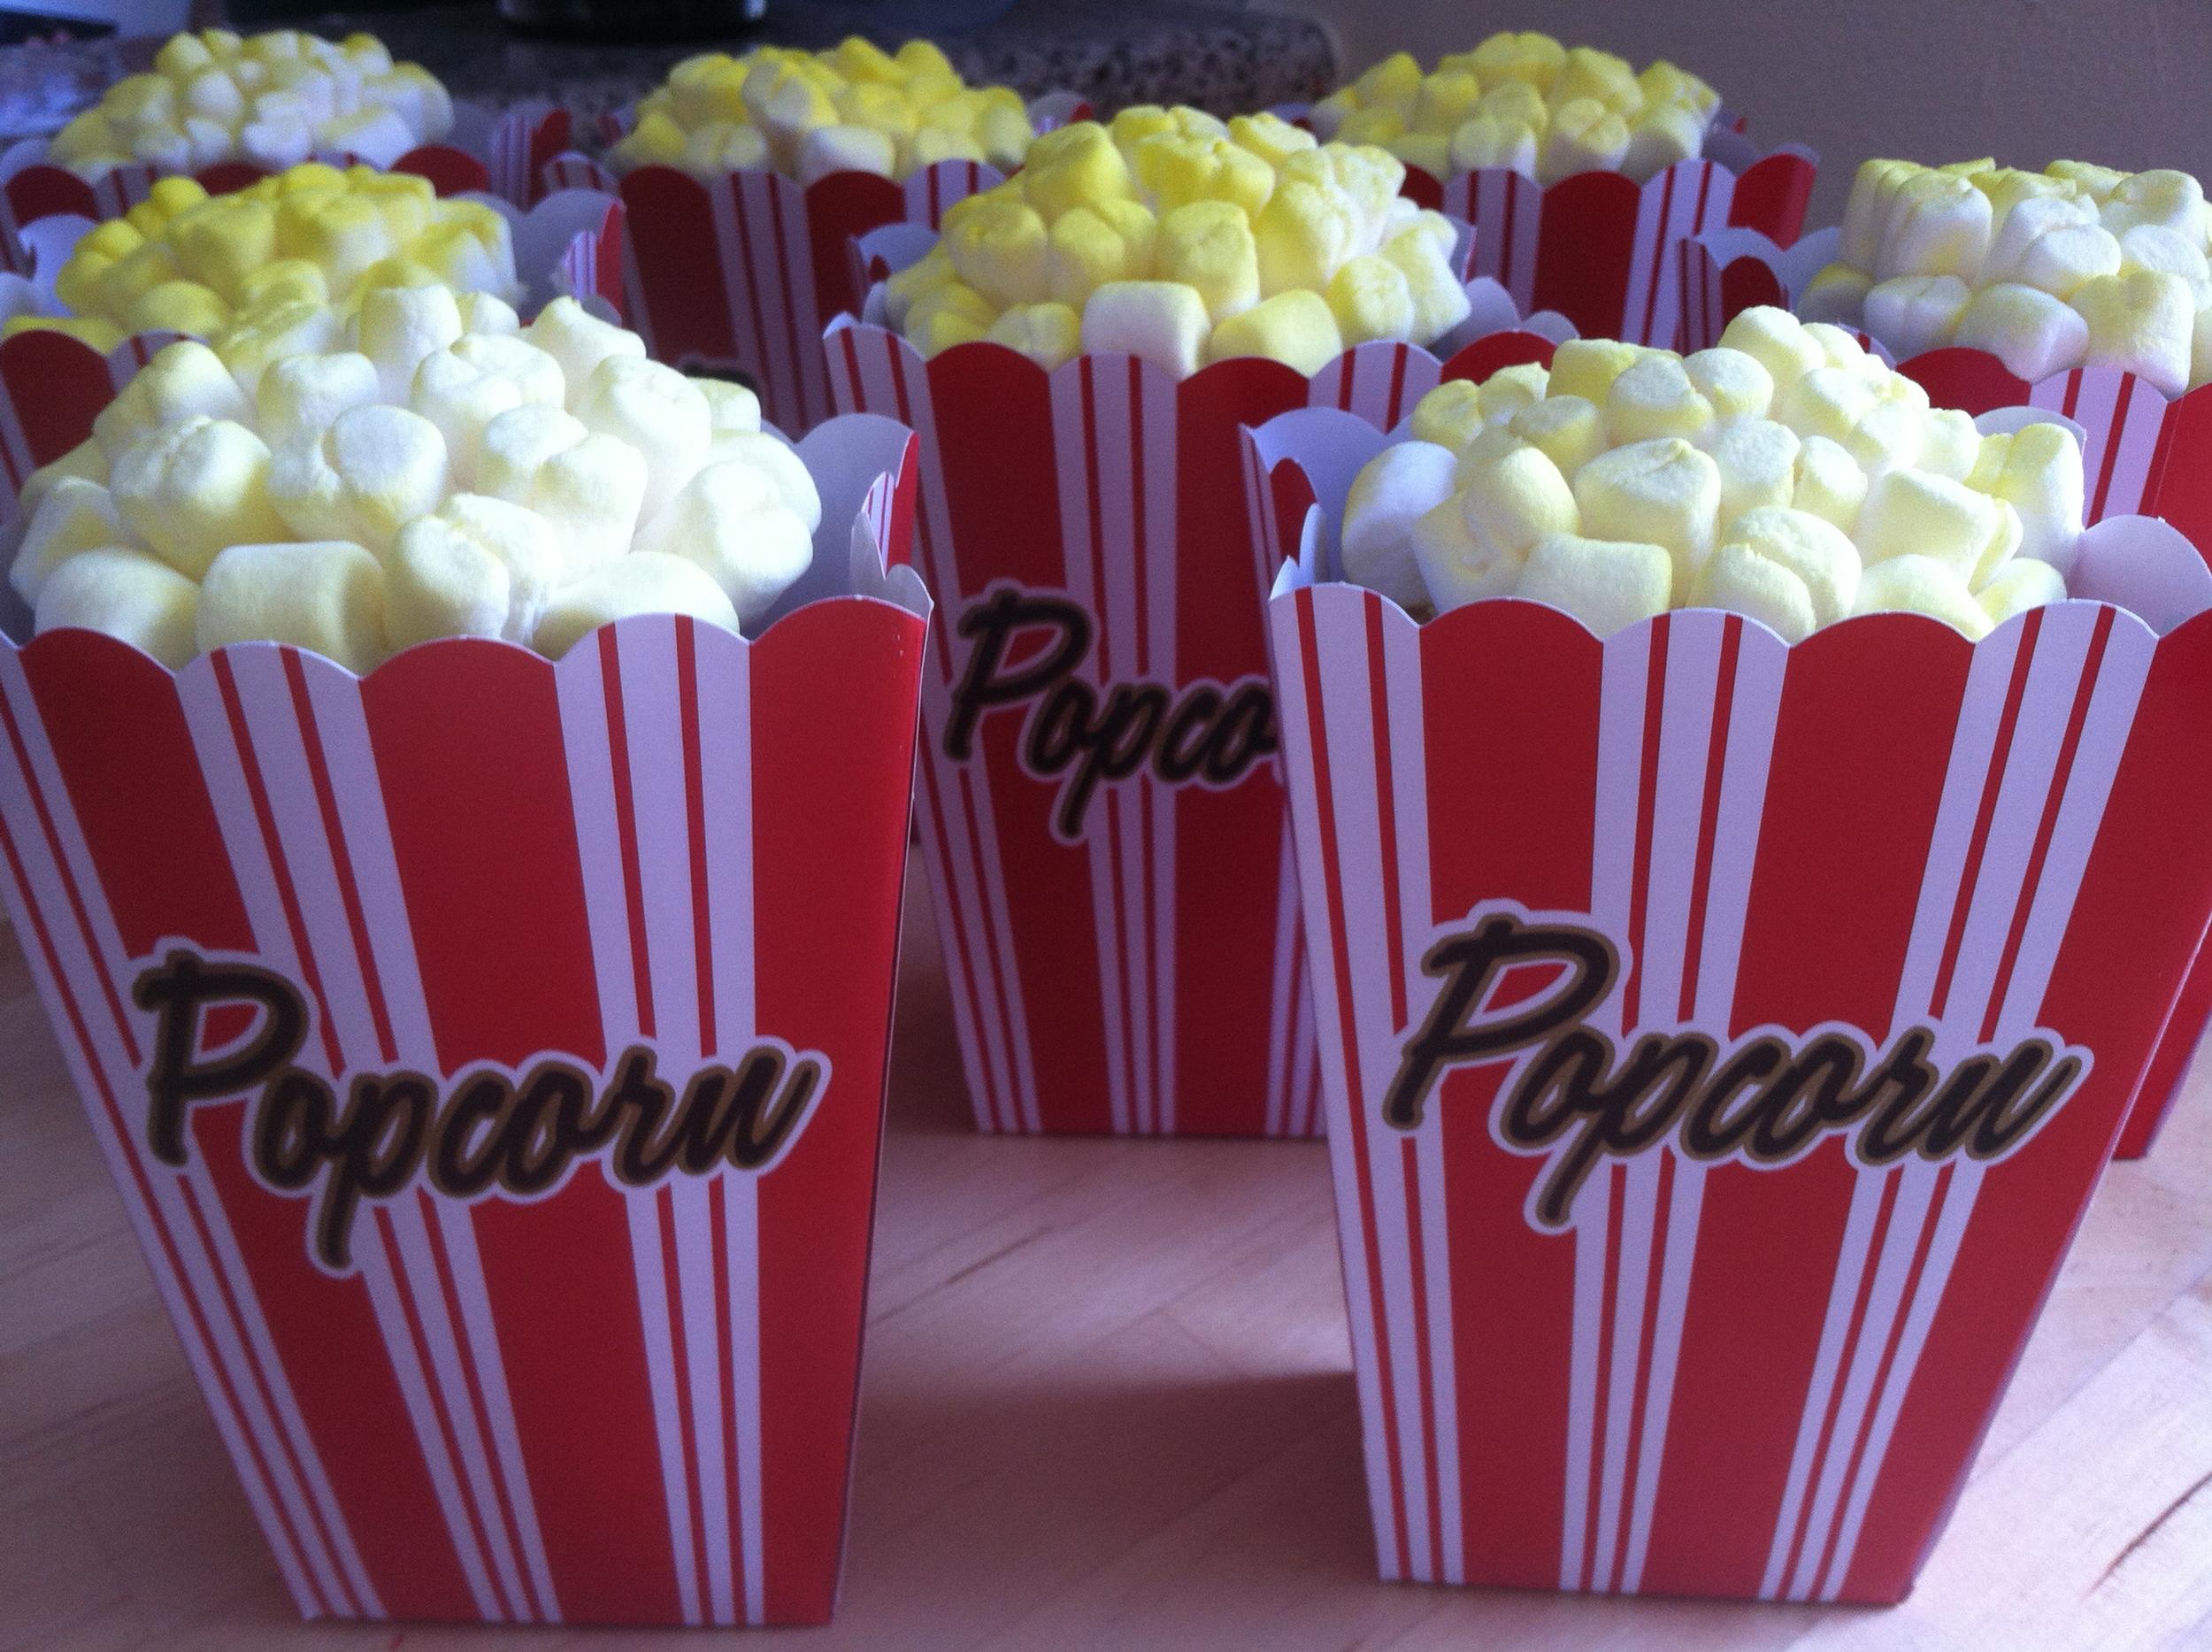 popcorn©2013 reality bites cupcakes inc..JPG